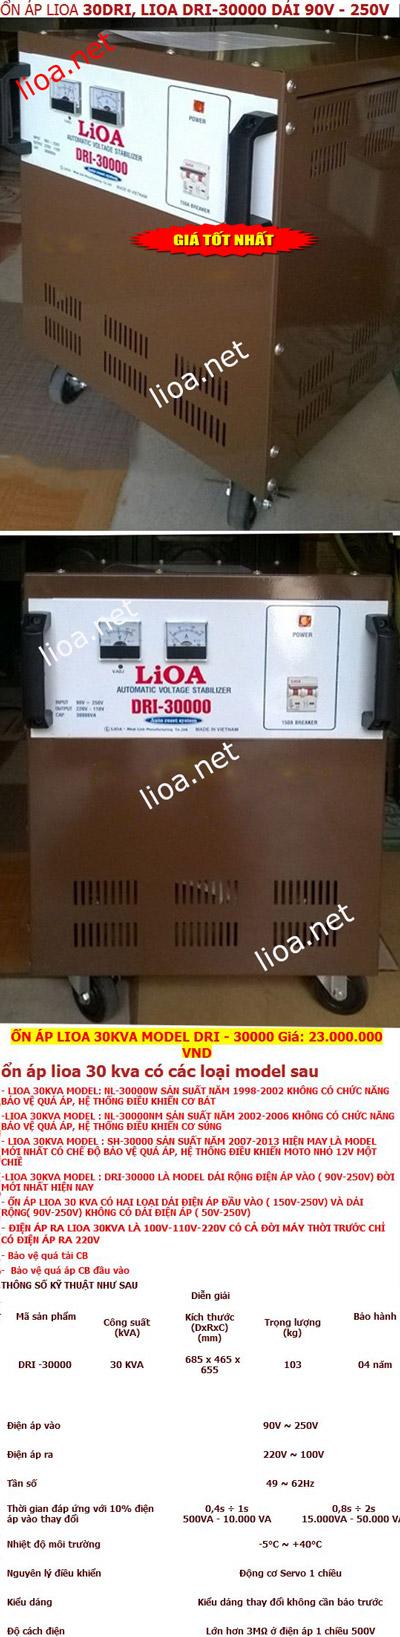 GIỚI THIỆU LIOA 30KVA MODEL DRI-30000